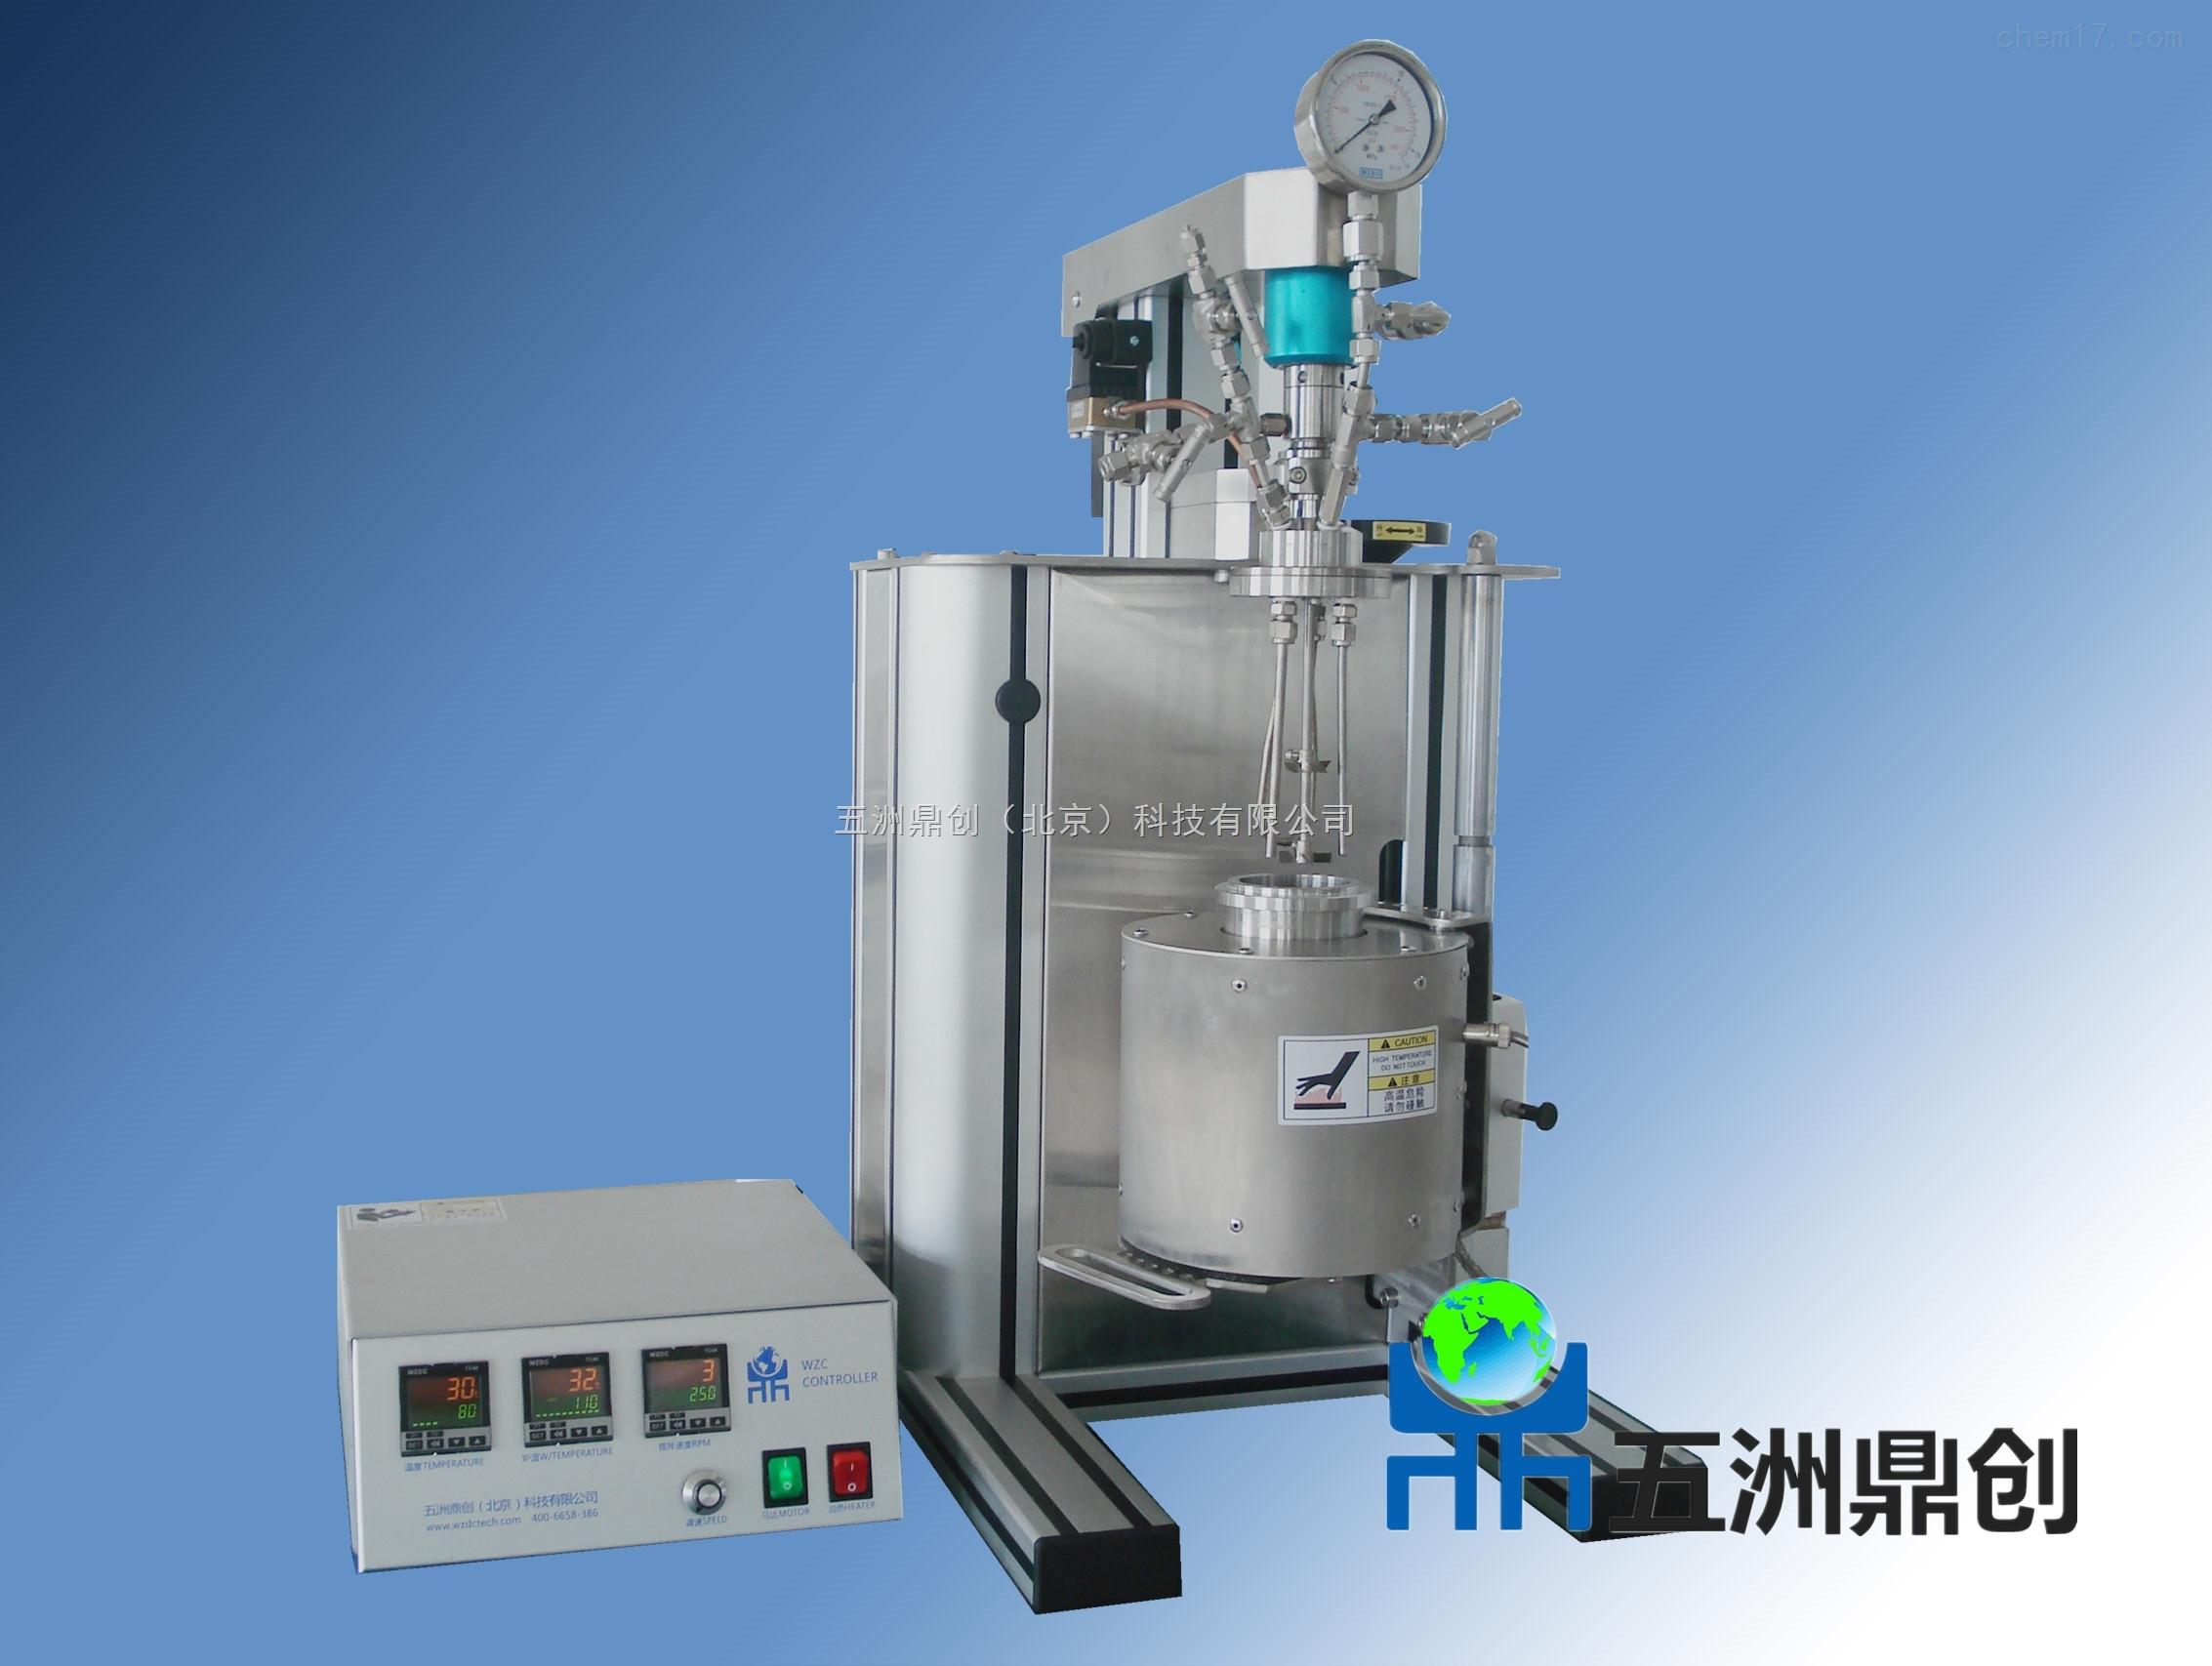 WZ100北京鼎创电加热不锈钢微型小型釜